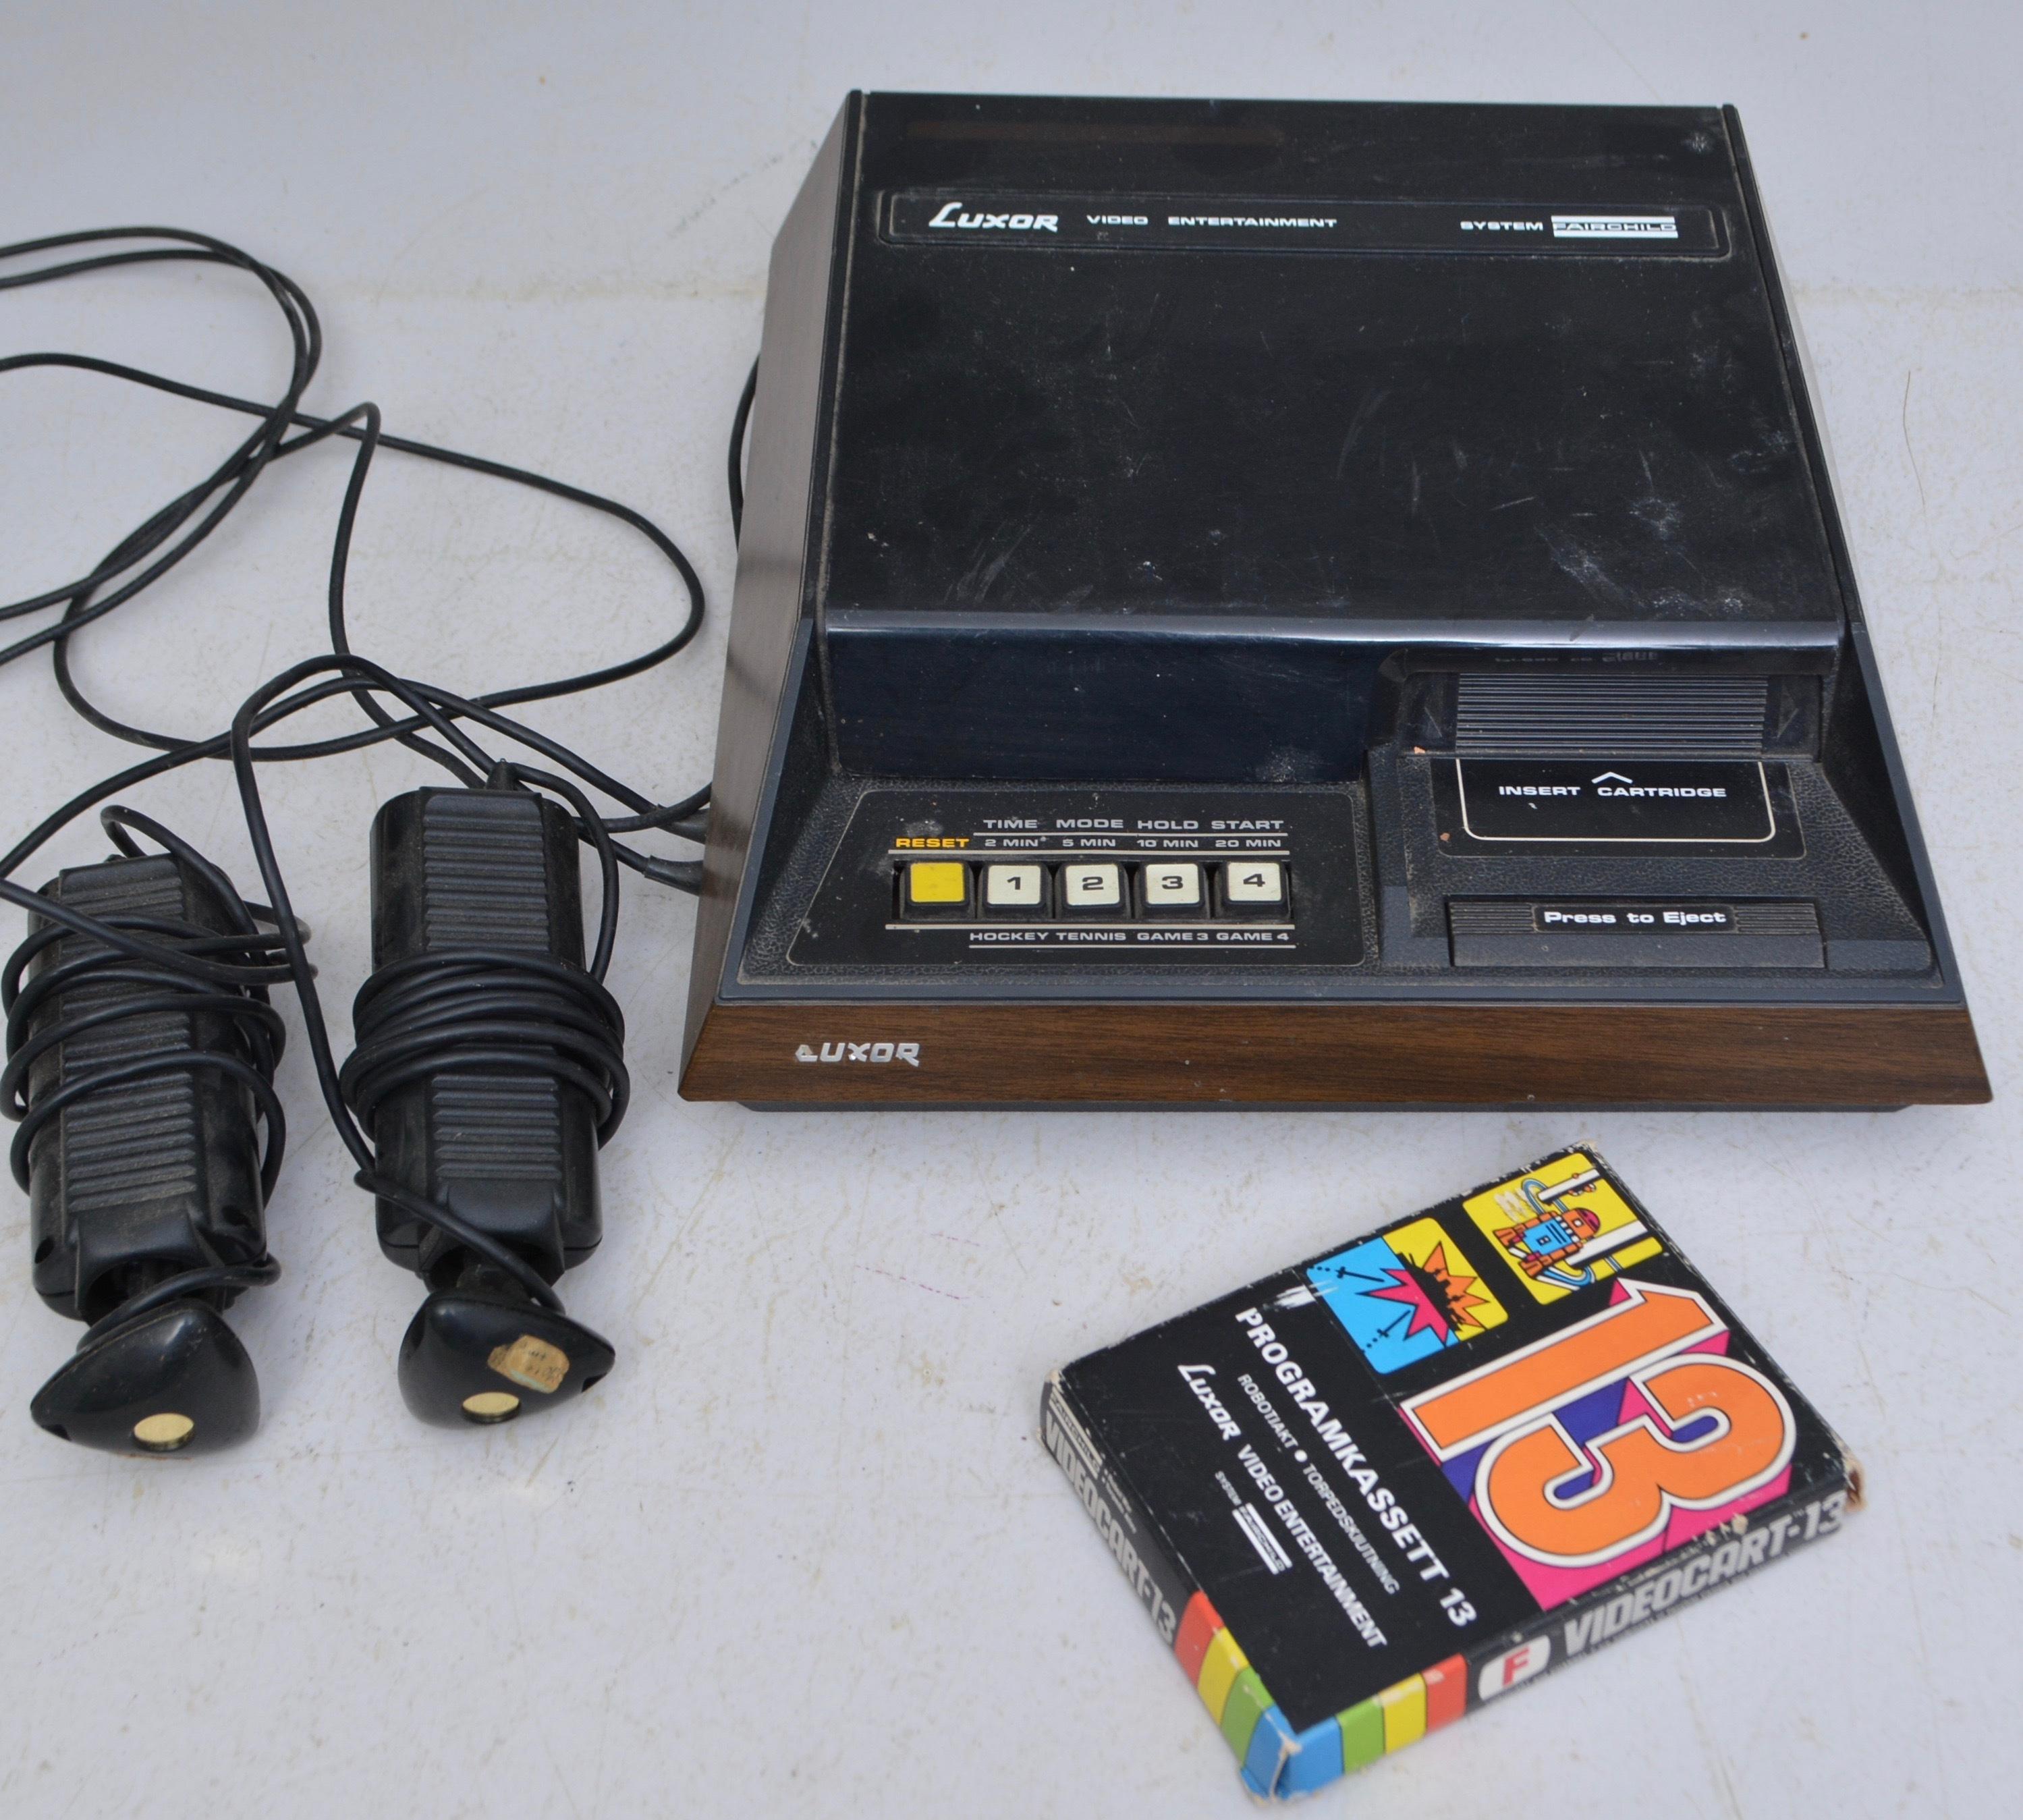 Ongekend TV-SPEL, Luxor retro. Other - Modern consumer electronics - Auctionet BH-83